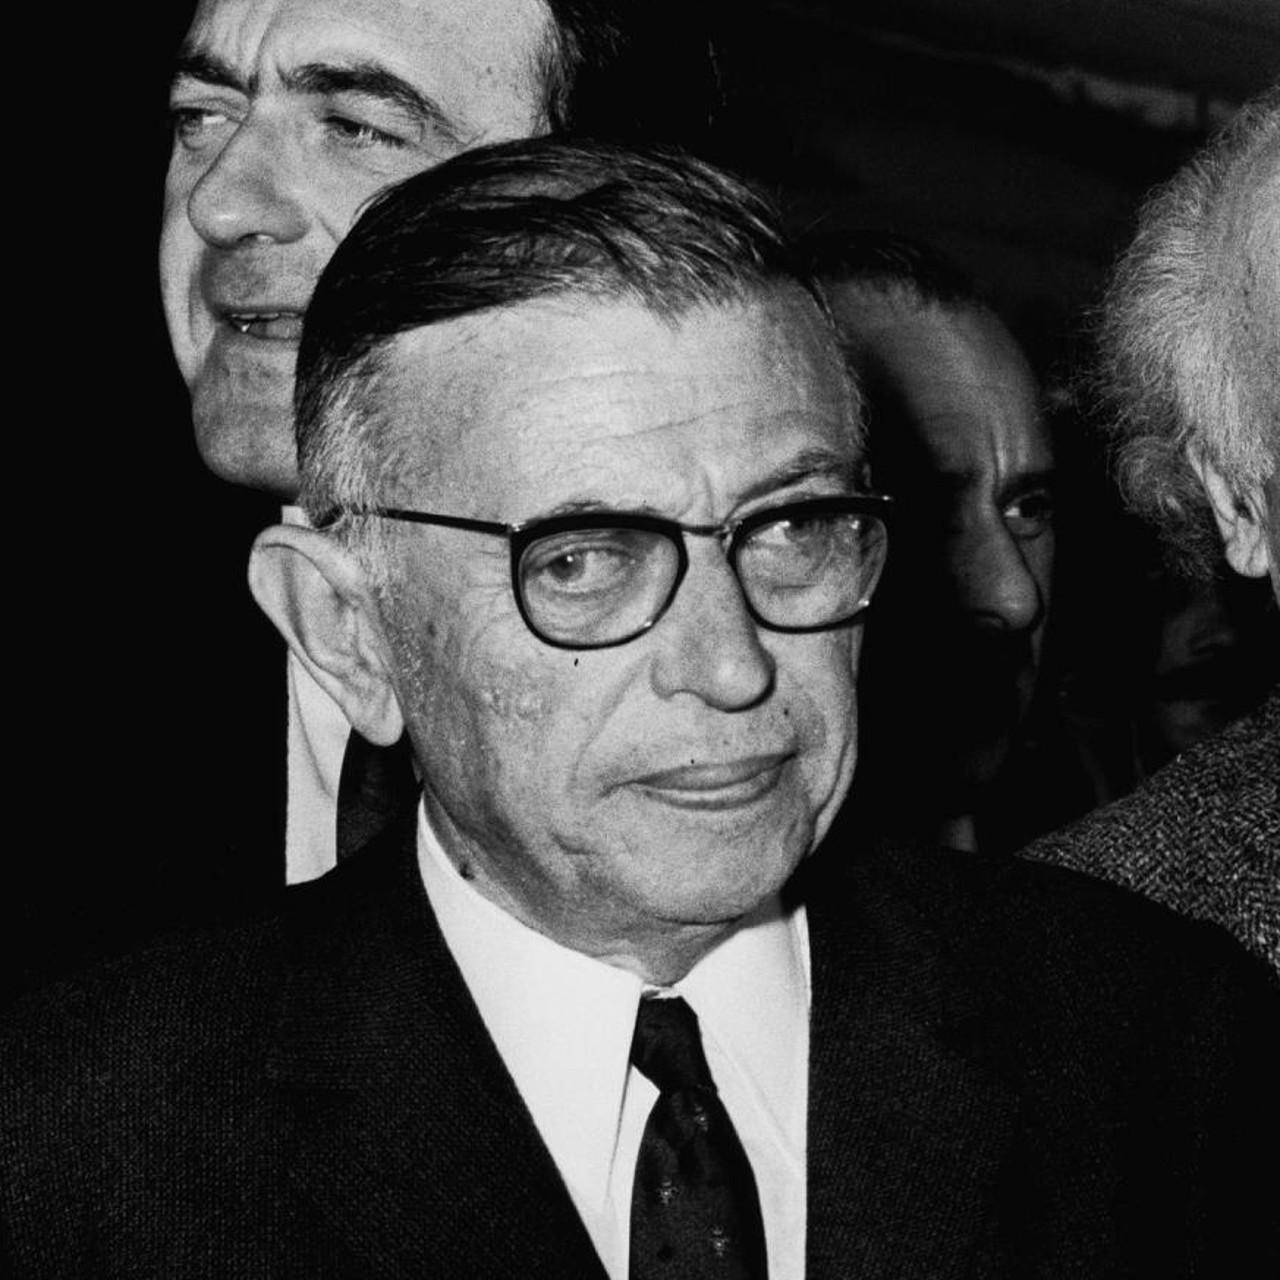 جان بول سارتر